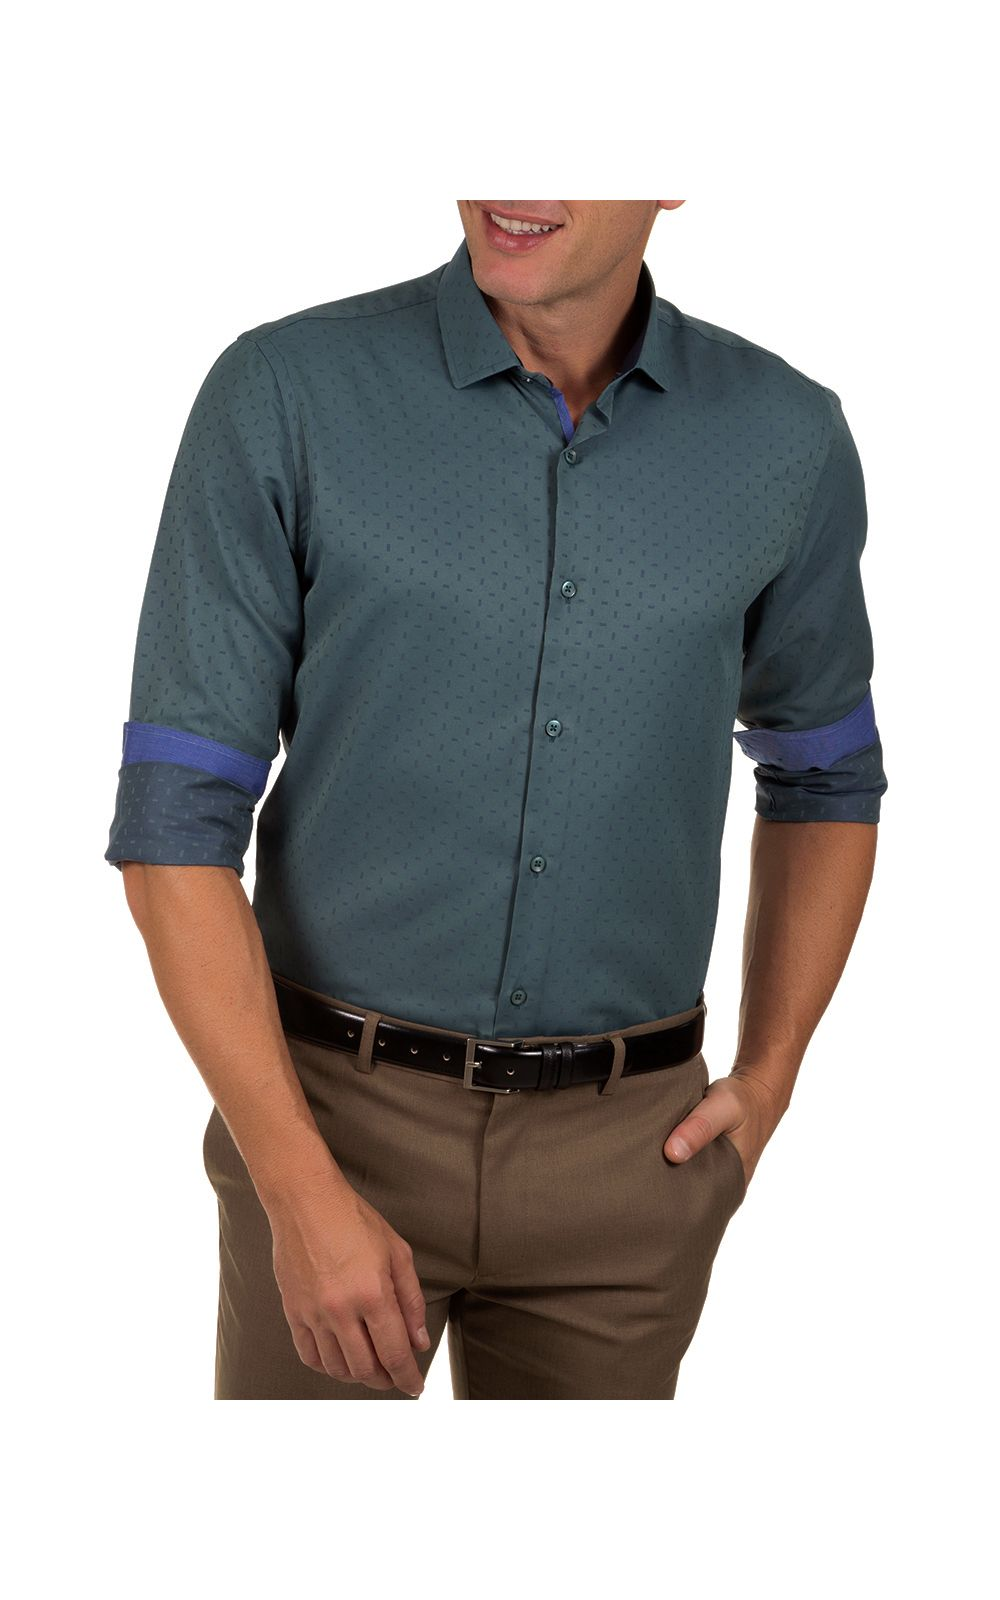 Foto 1 - Camisa Social Masculina Azul Escuro Detalhada